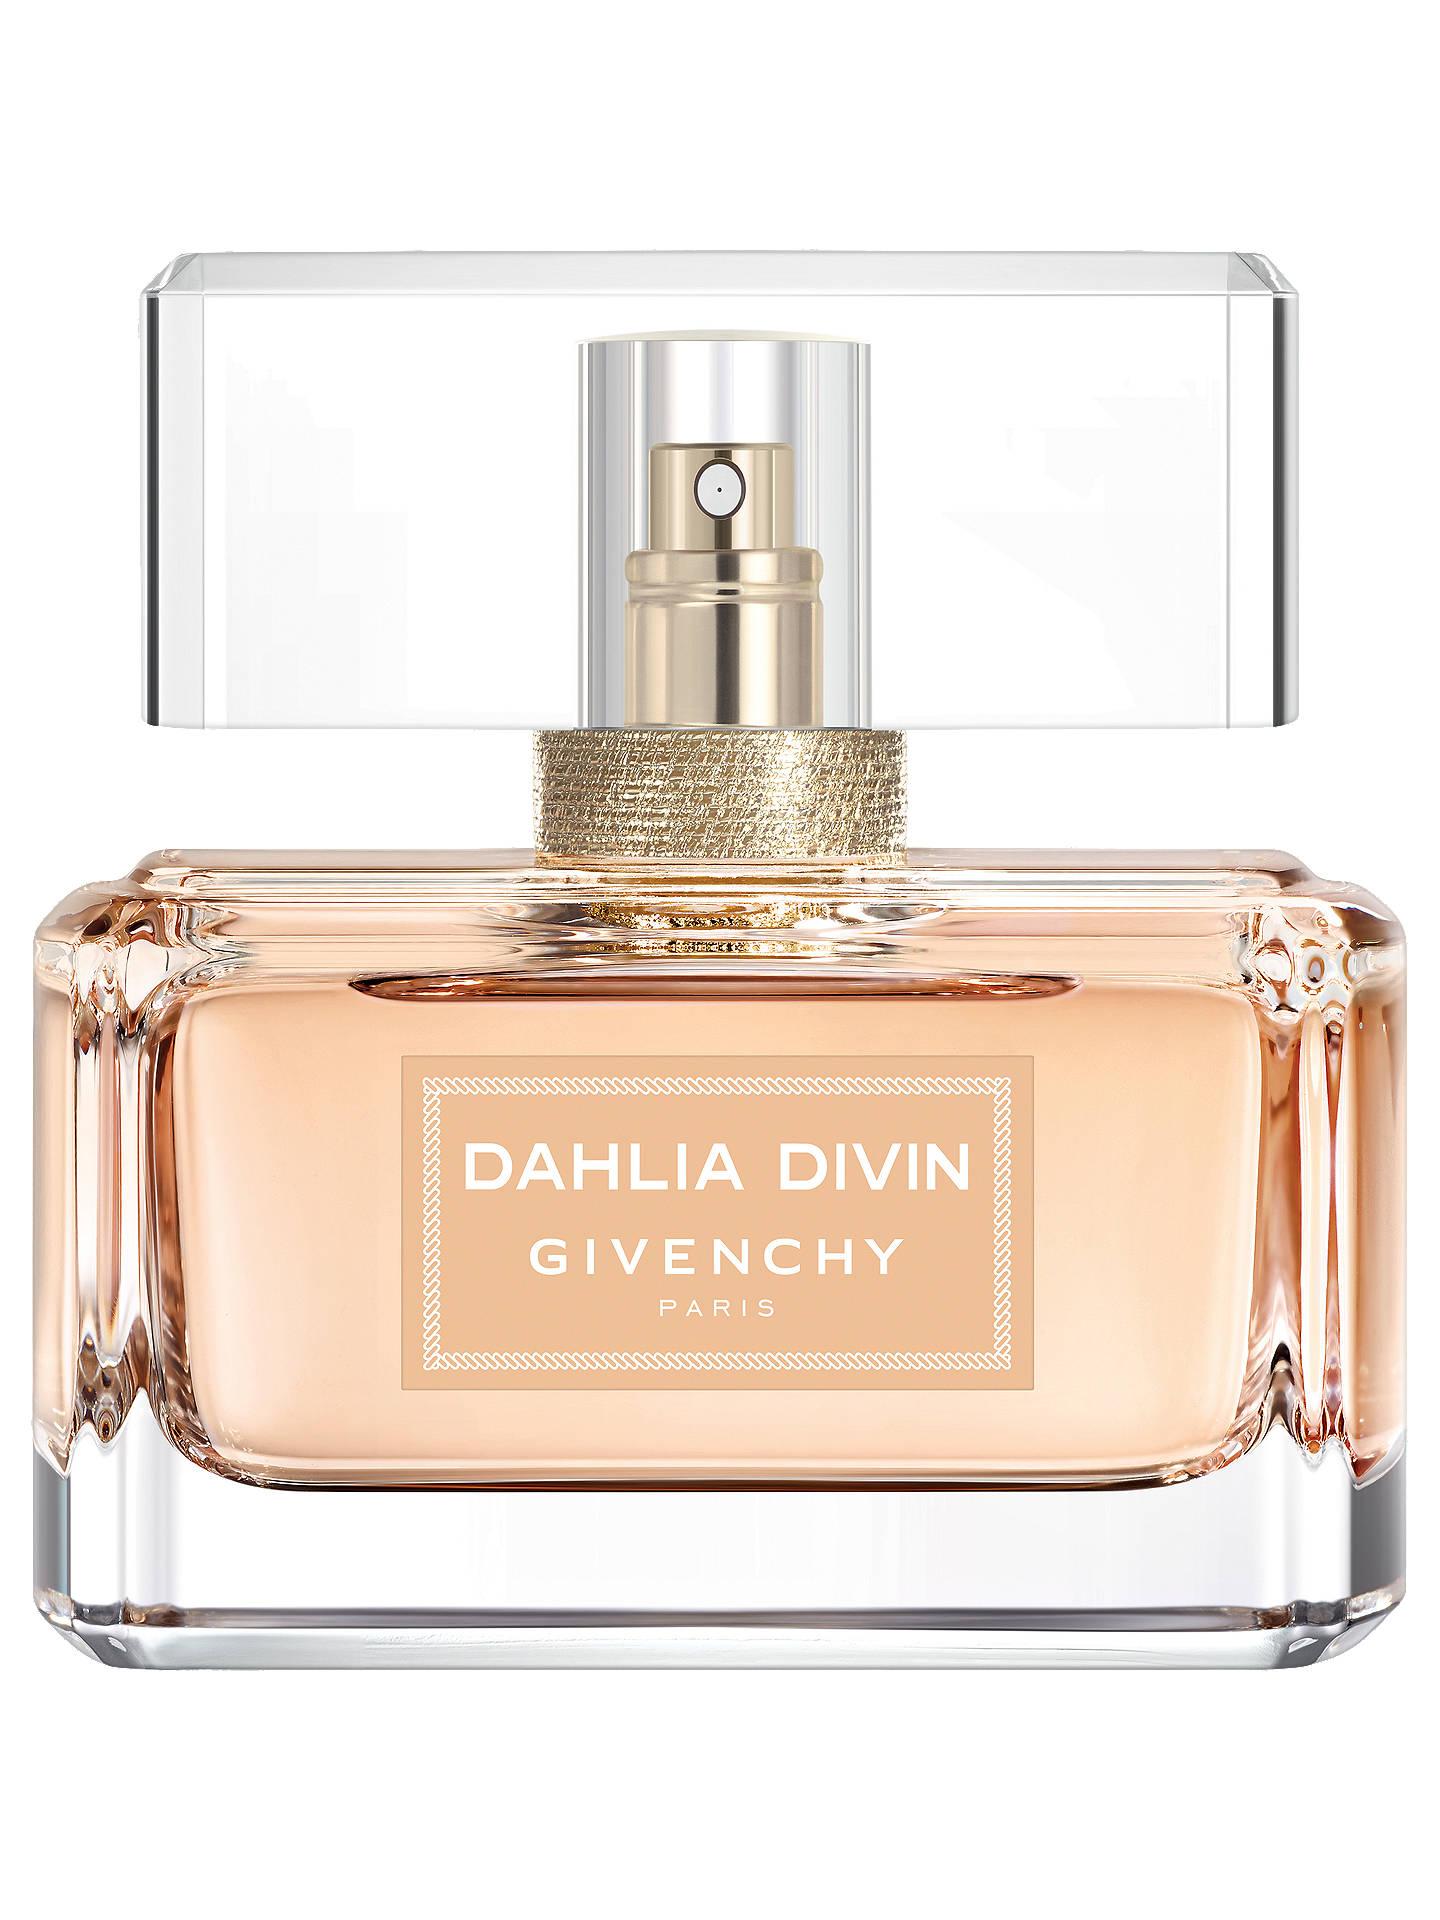 80f9b9aebb4a Givenchy Dahlia Divin Nude Eau de Parfum at John Lewis   Partners